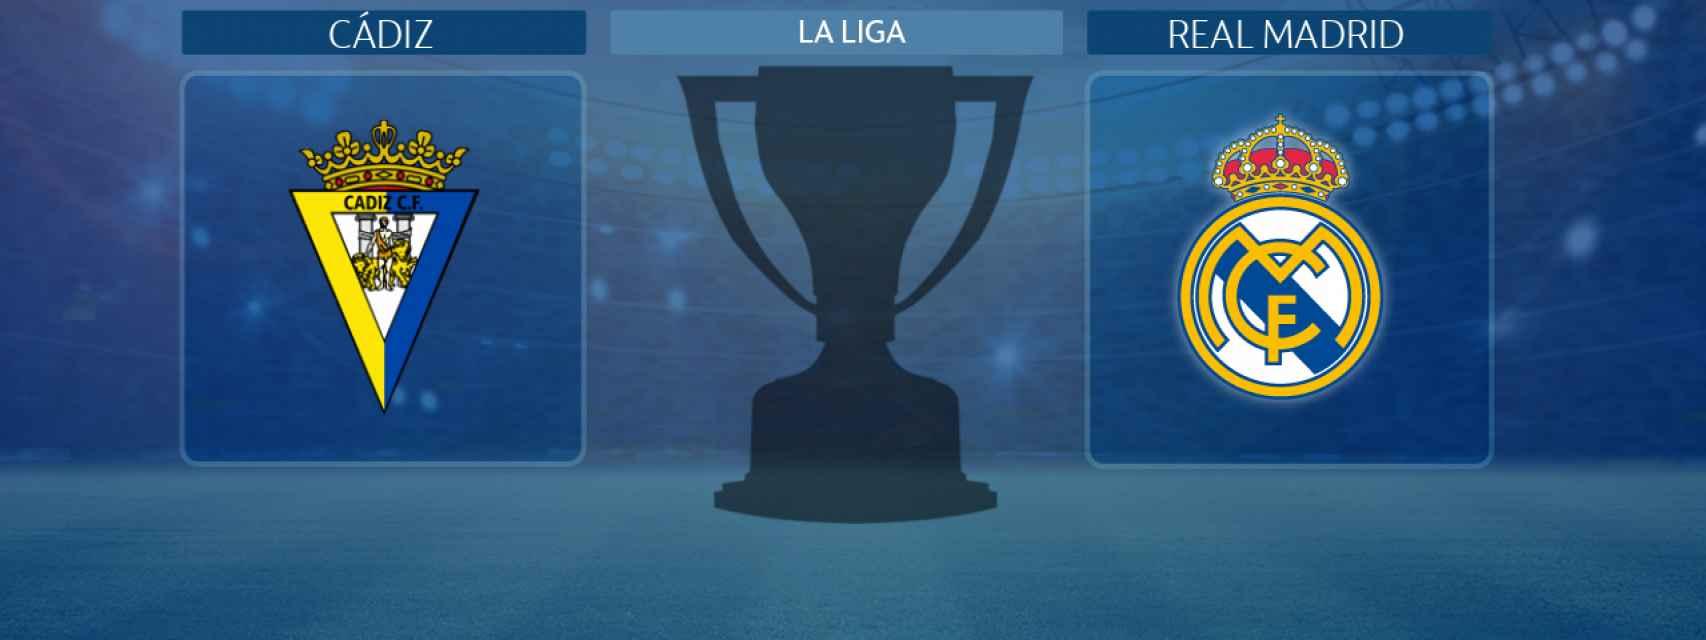 Cádiz - Real Madrid, partido de La Liga